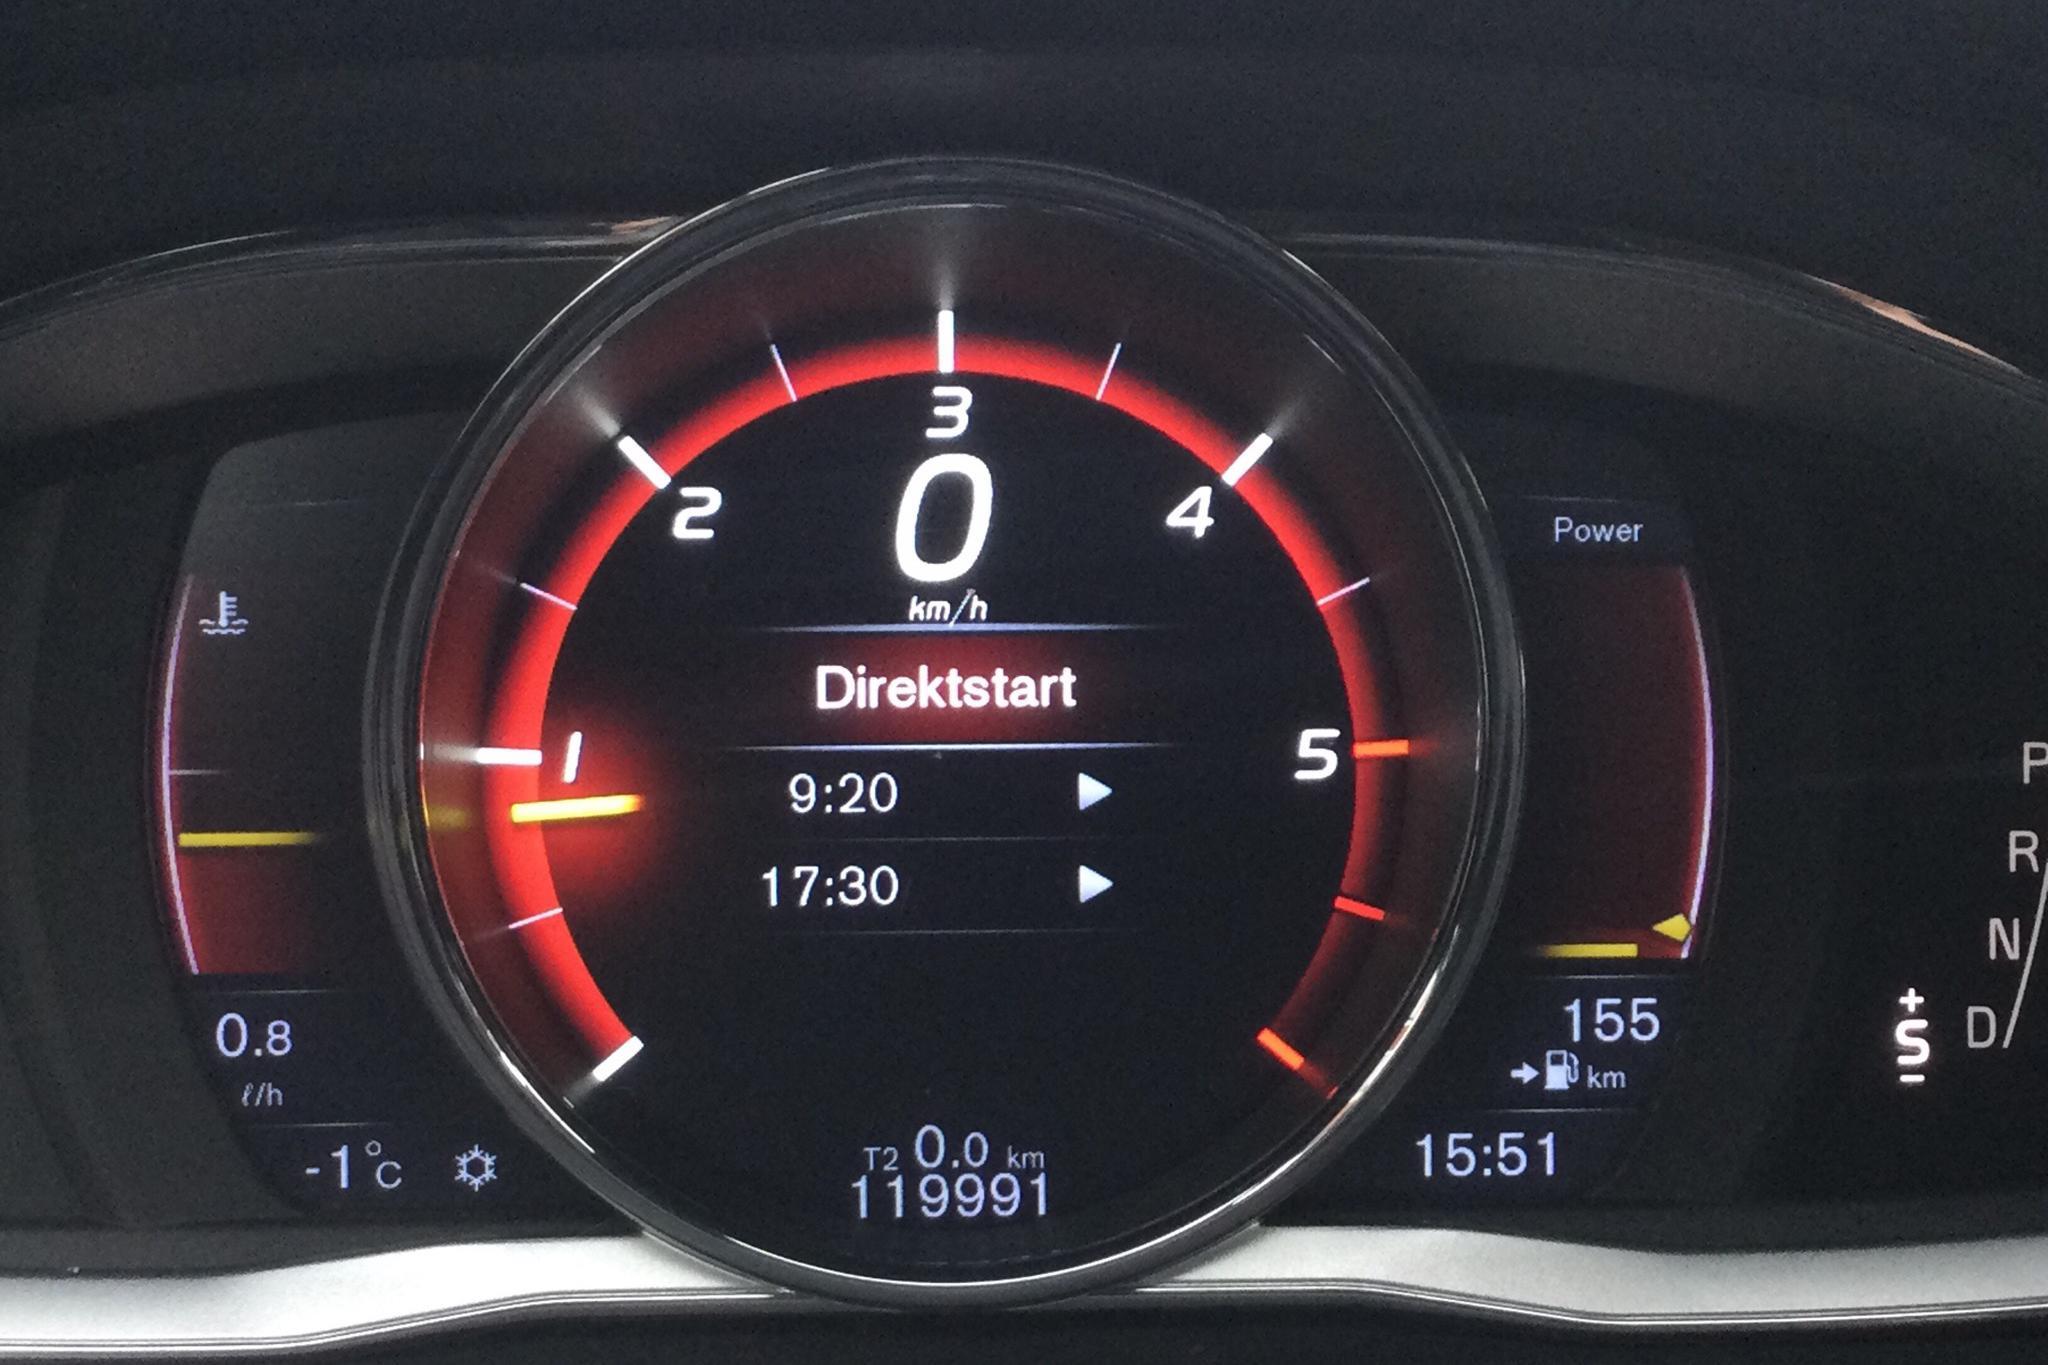 Volvo V60 D5 (225hk) - 119 990 km - Automatic - black - 2016